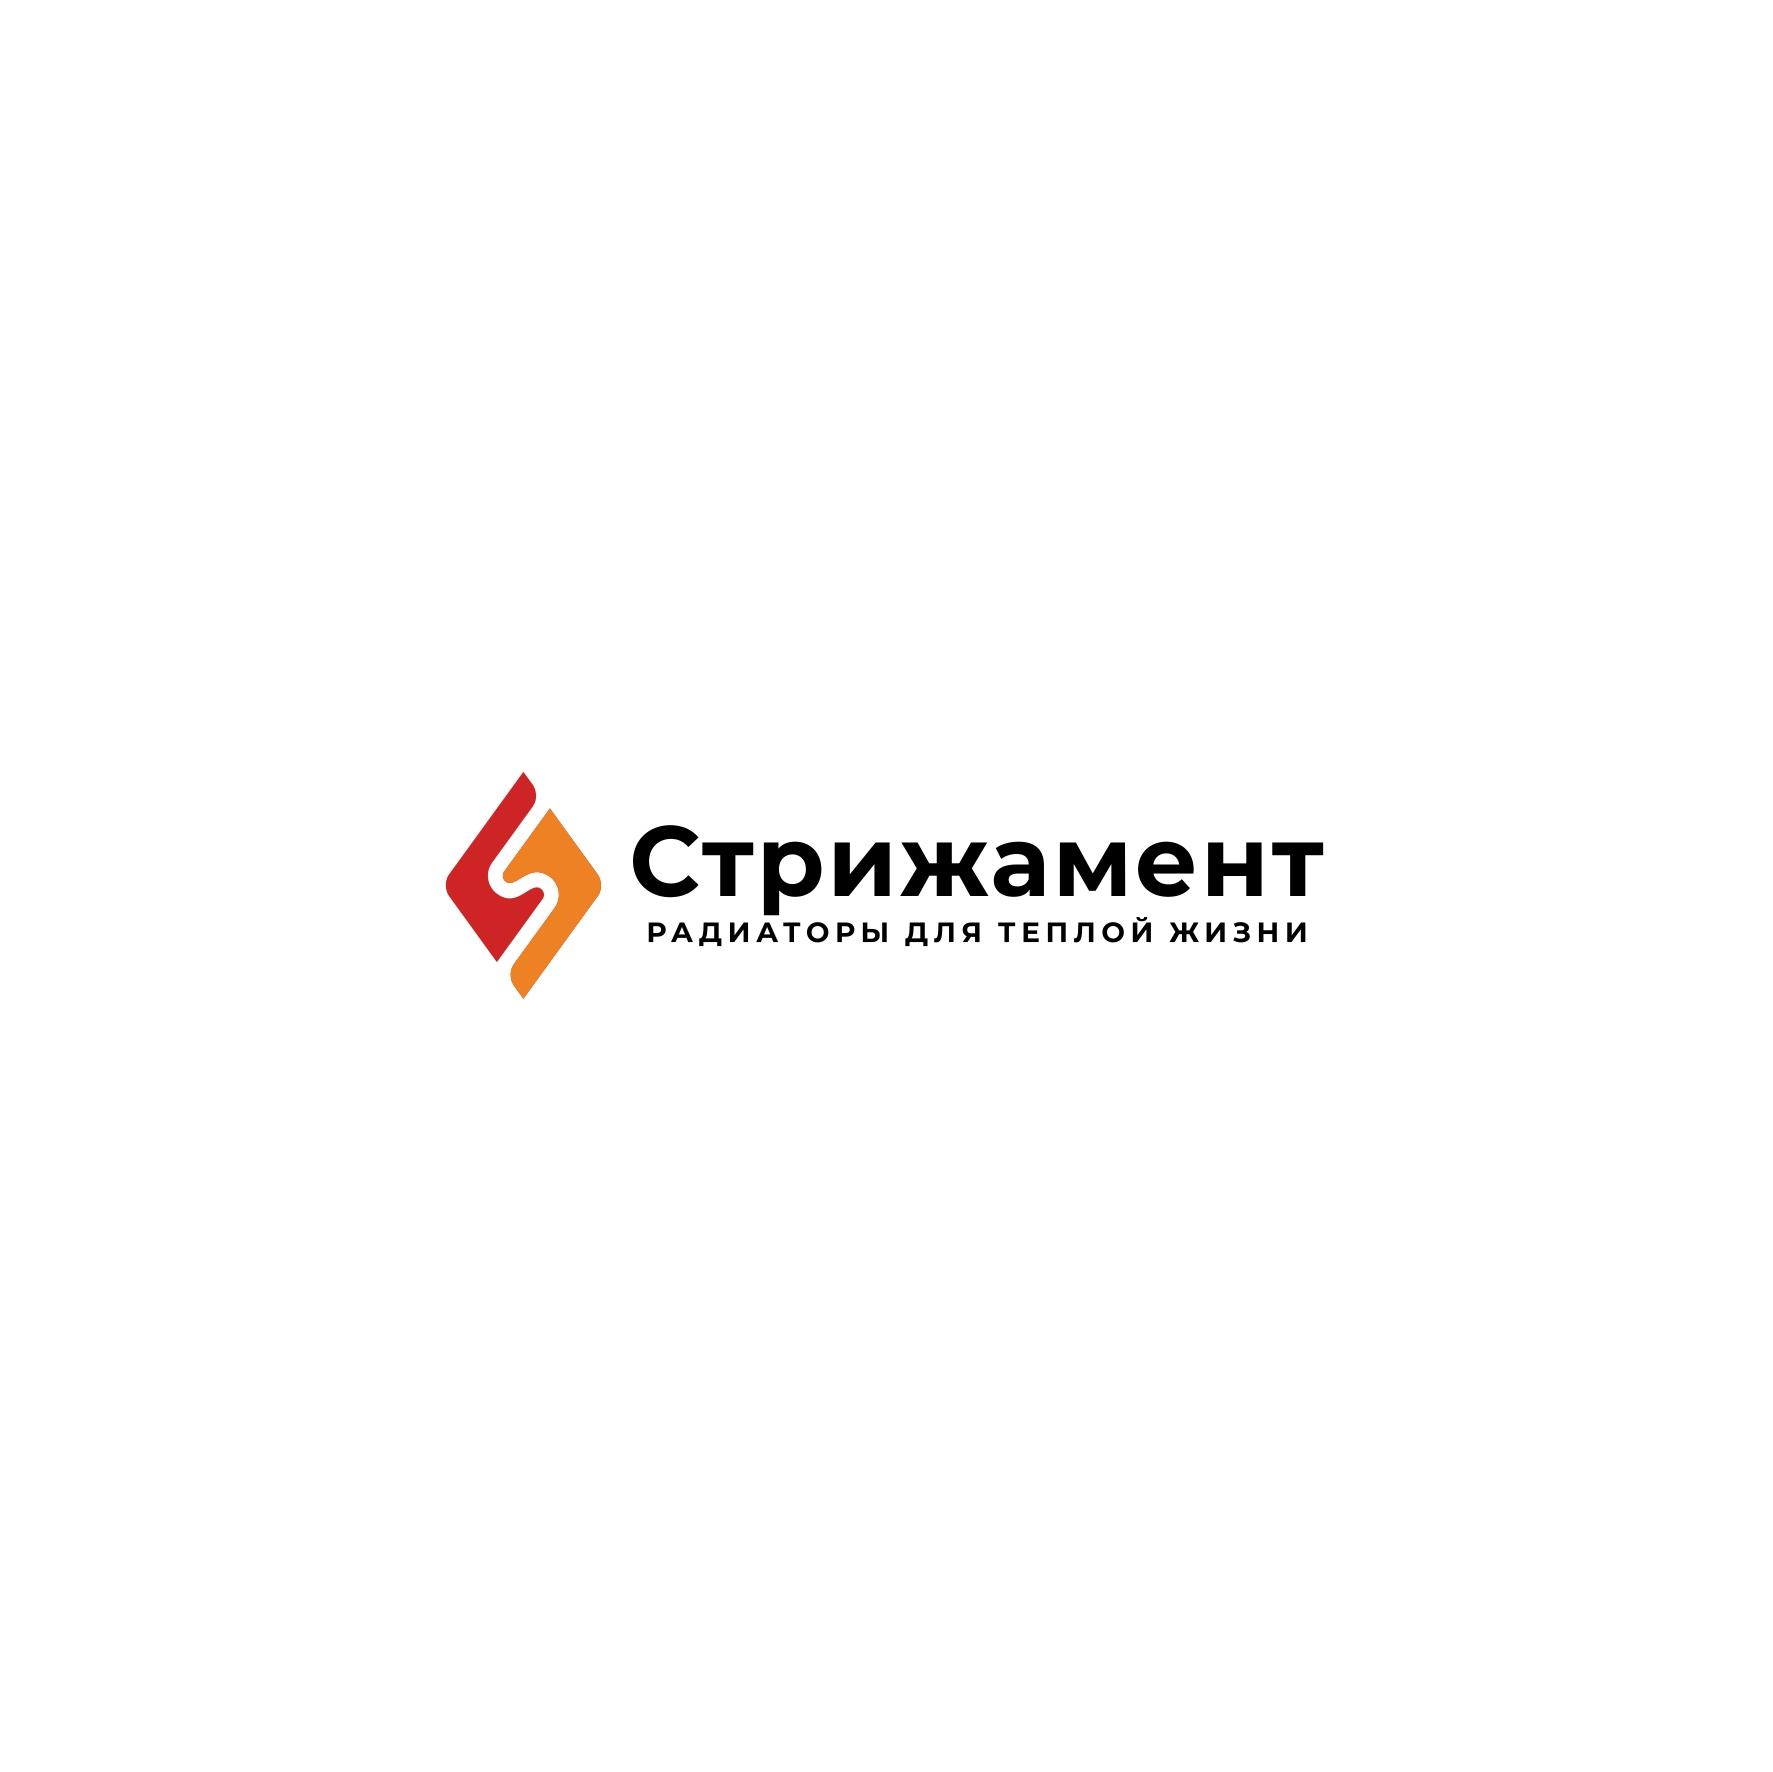 Дизайн лого бренда фото f_5185d512b5357102.jpg